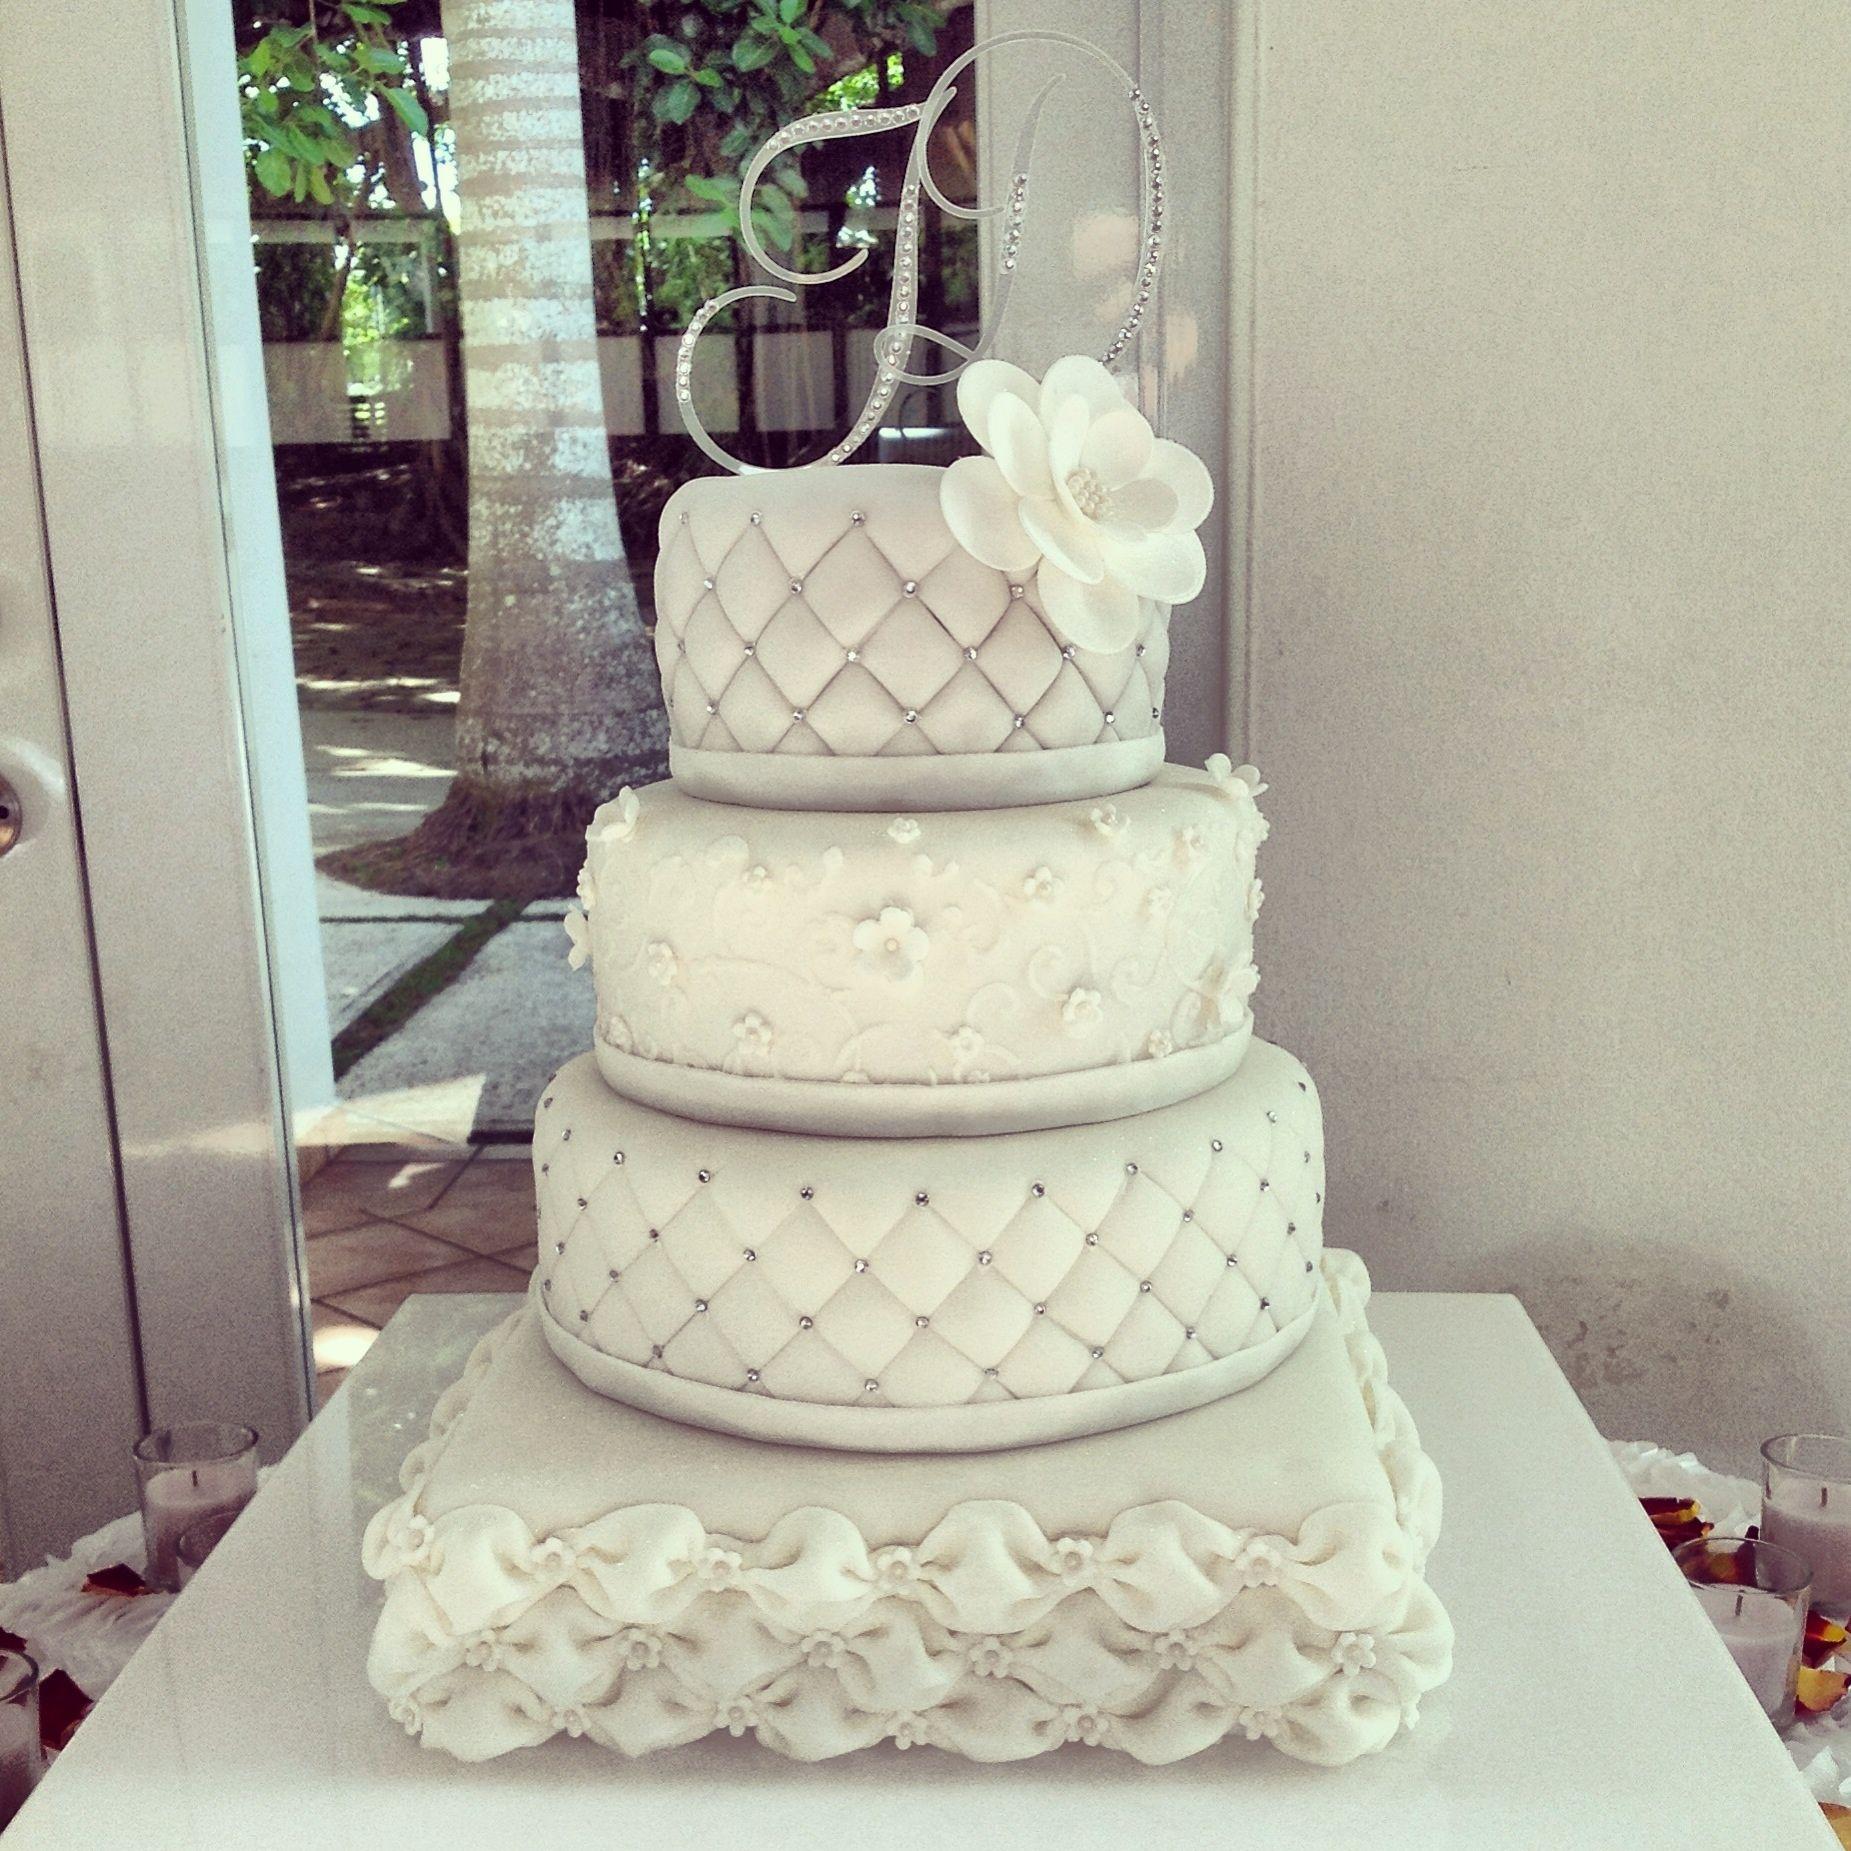 Wedding Cake: Admirable Vintage Wedding Cakes Ideas — Salondegas.com